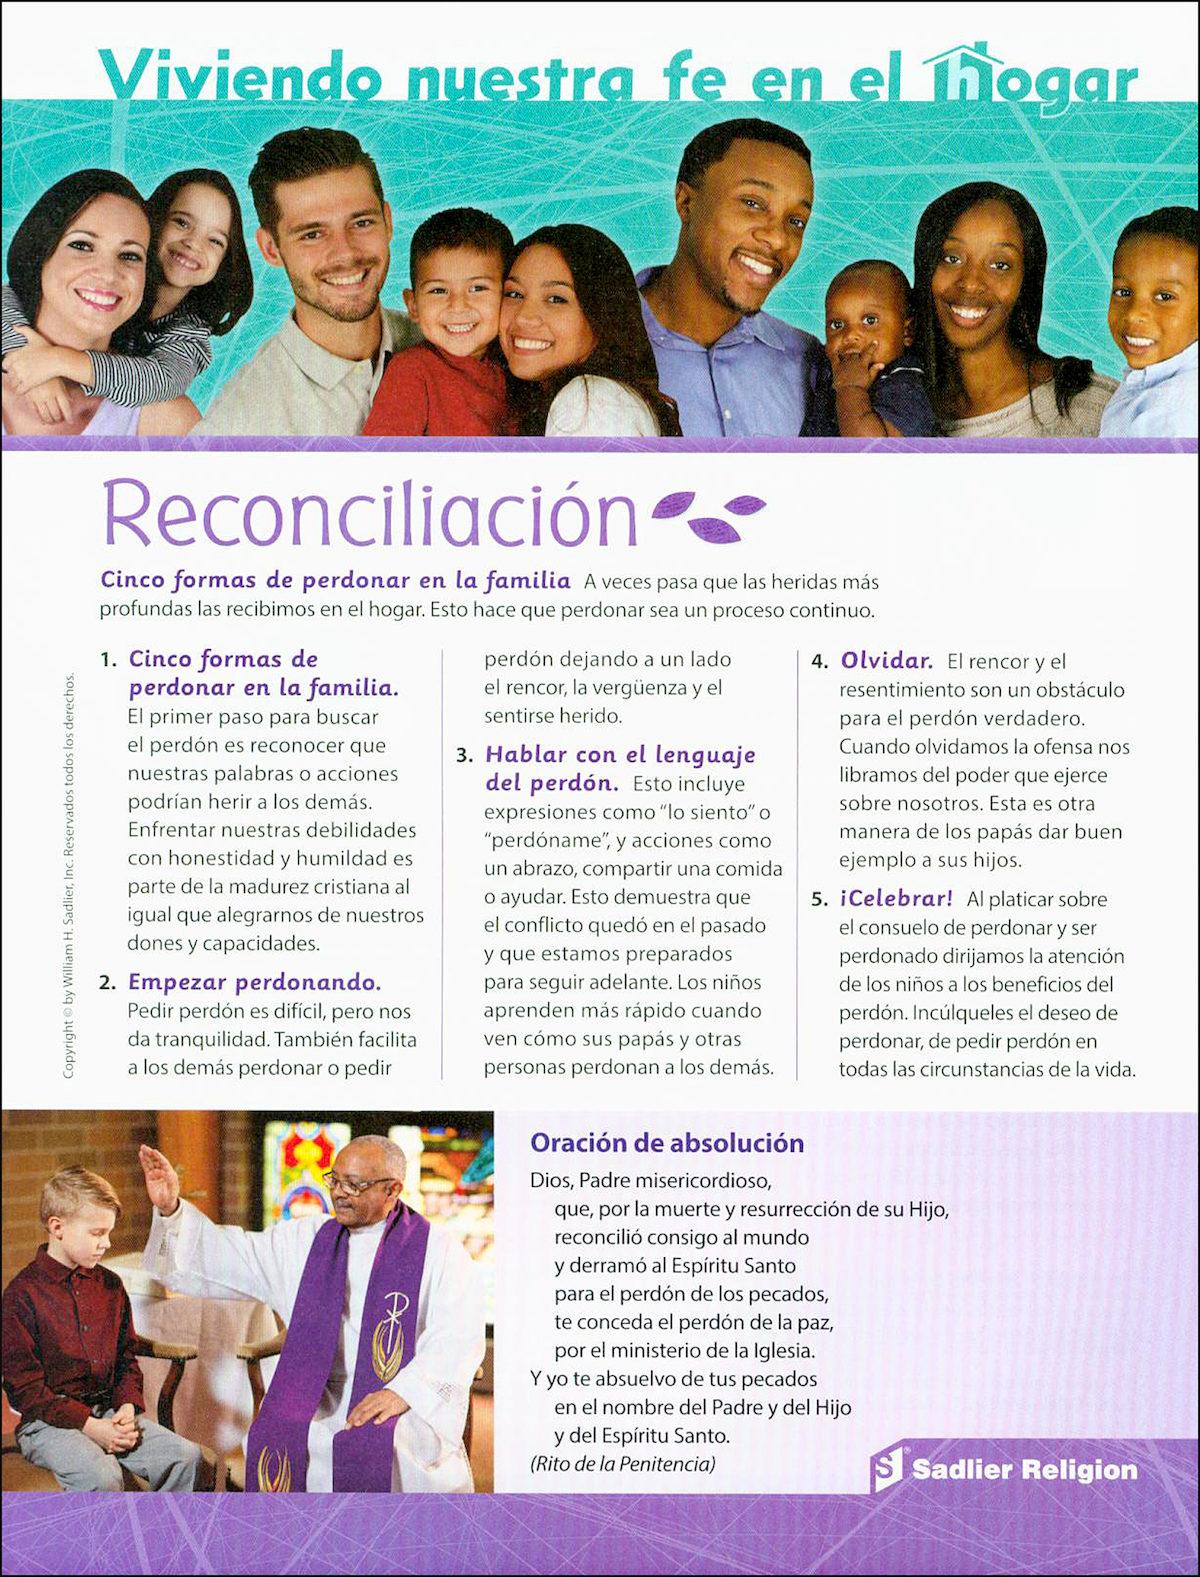 creer celebrar vivir  la reconciliaci u00f3n  living our faith at home  reconciliation  10